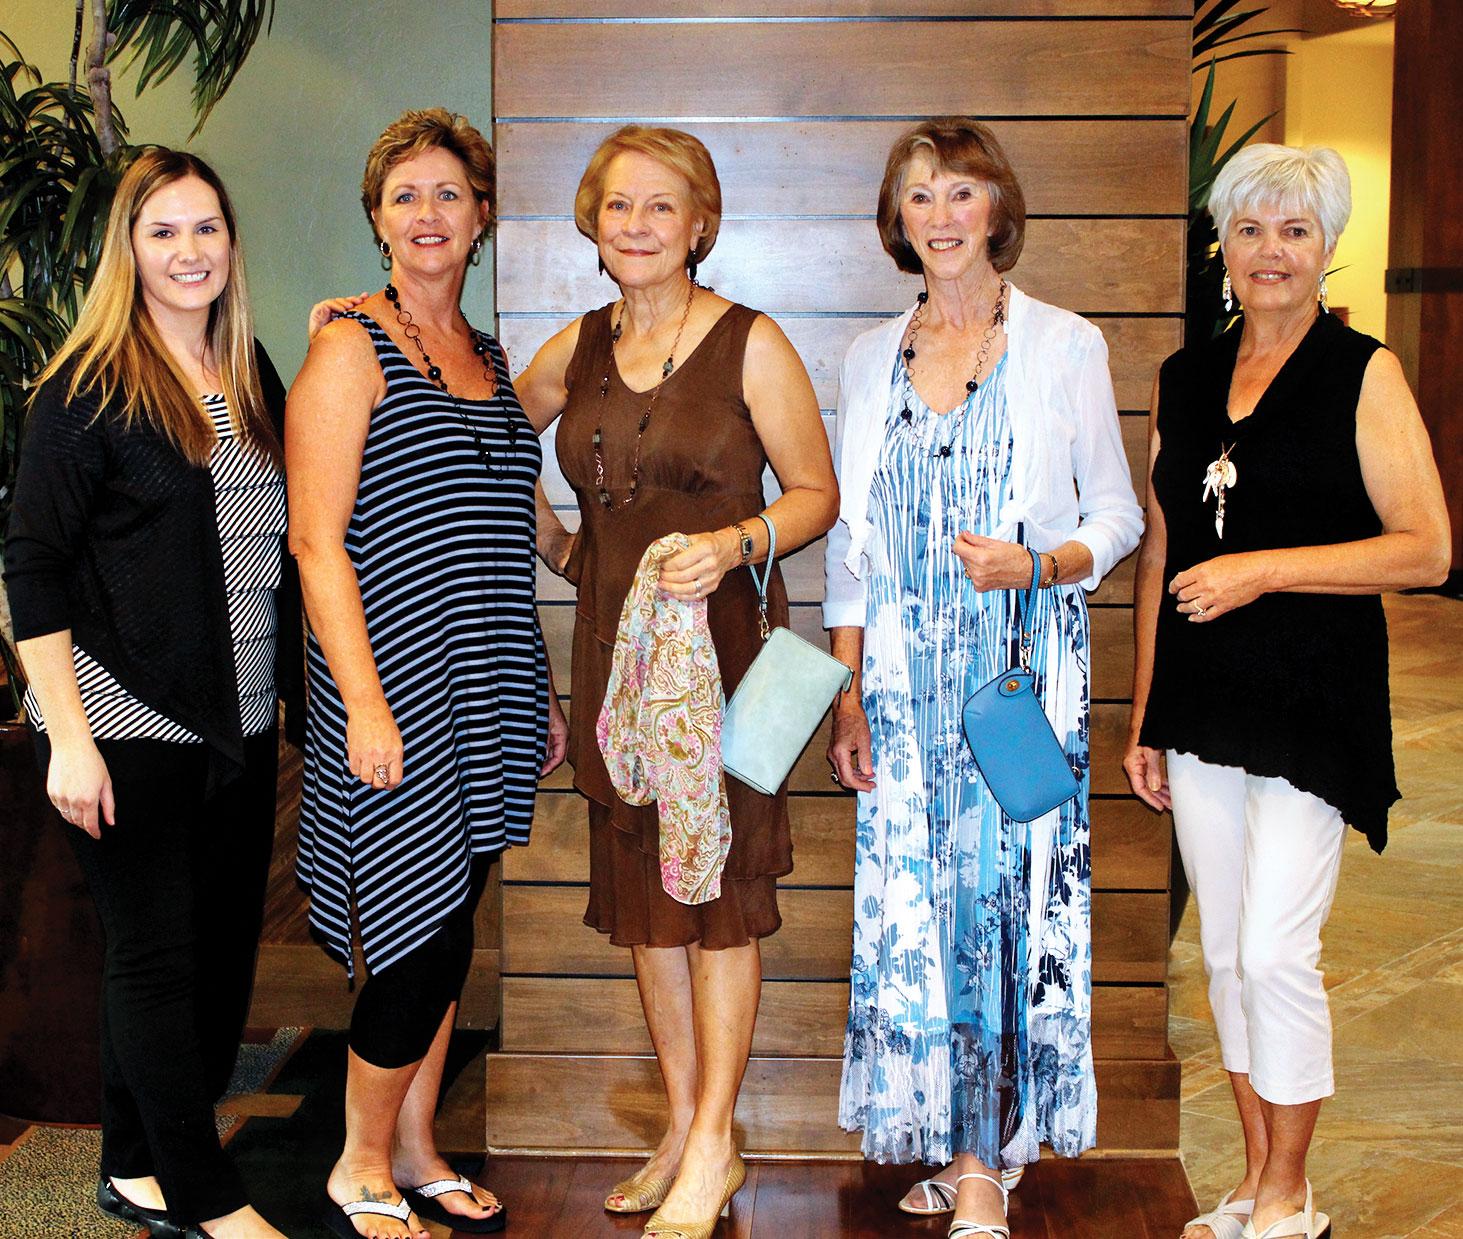 Left to right: Elaine Macedo from Nadine's; Models Stephanie Henricks, Joanna Hill-Devine and Sidonia St.Germaine; Dee Sanders, JEWEL founder.